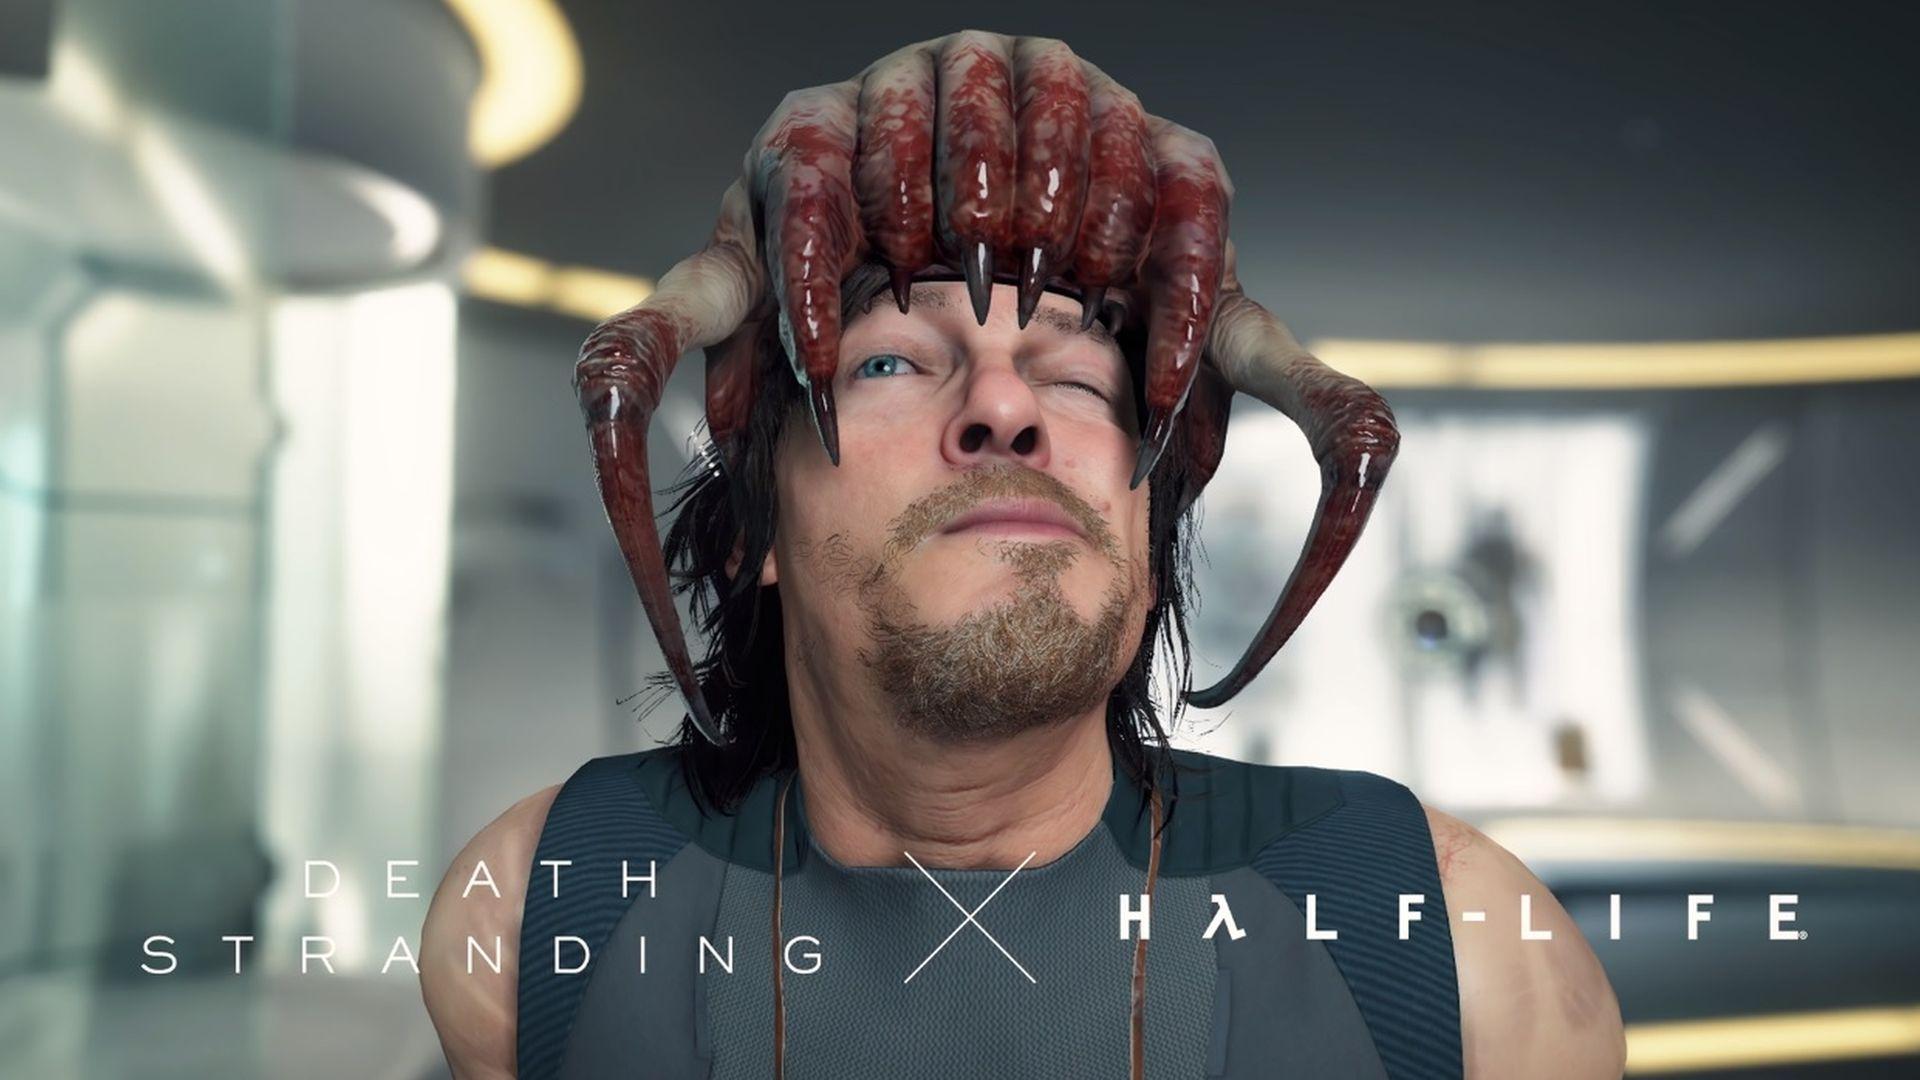 Death Stranding x Half-Life